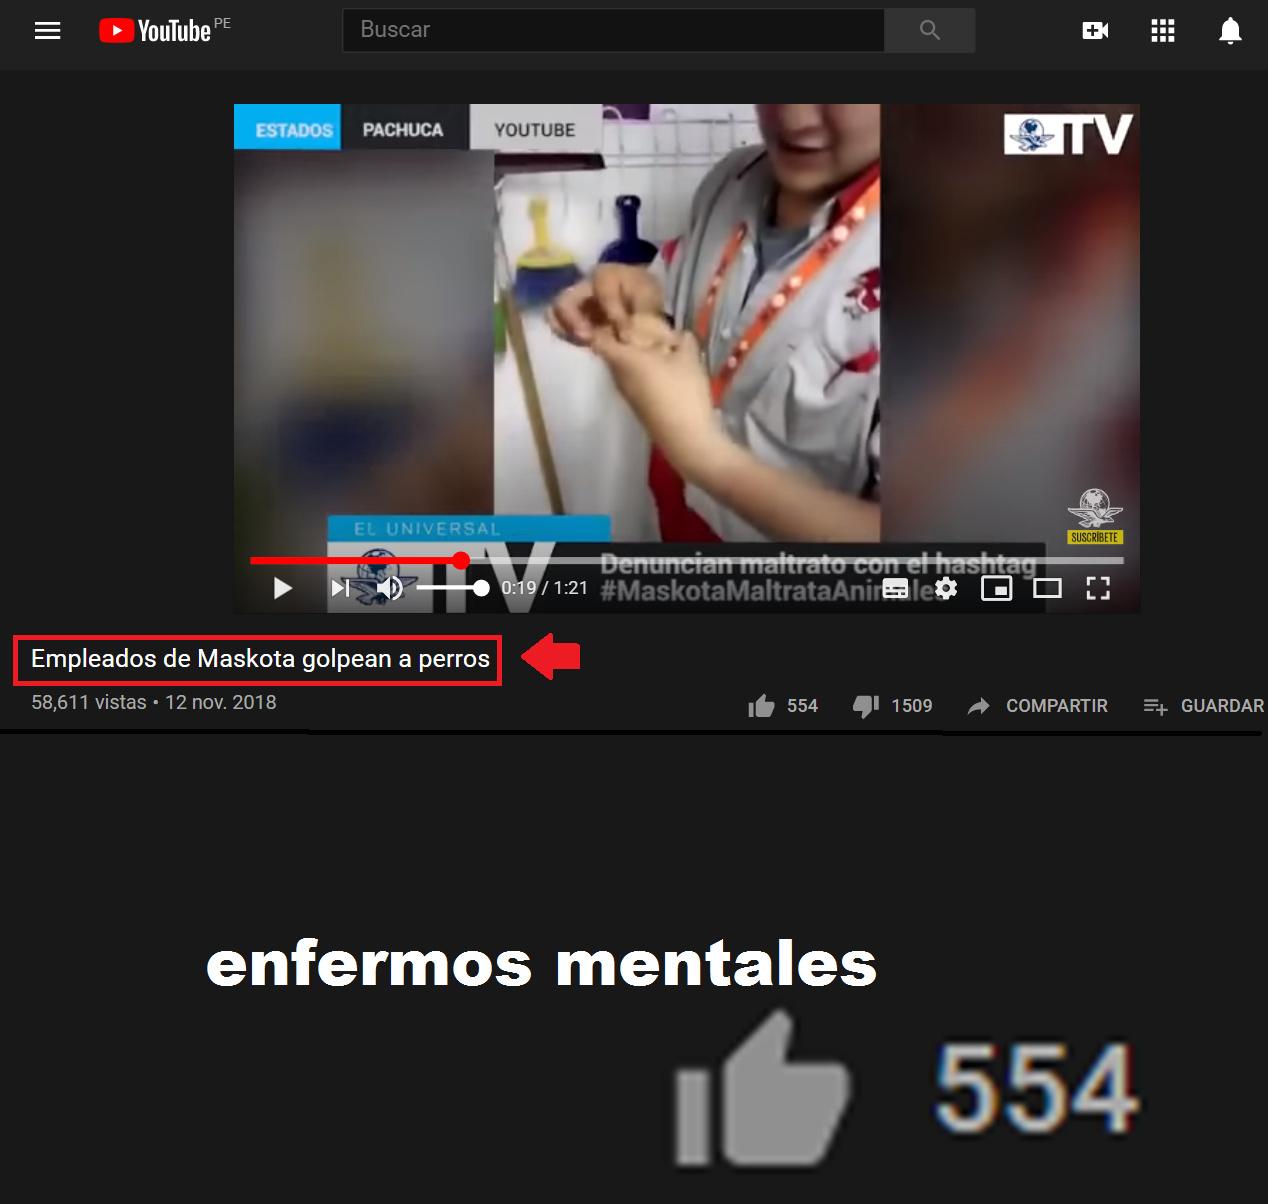 554 personas enfermas - meme